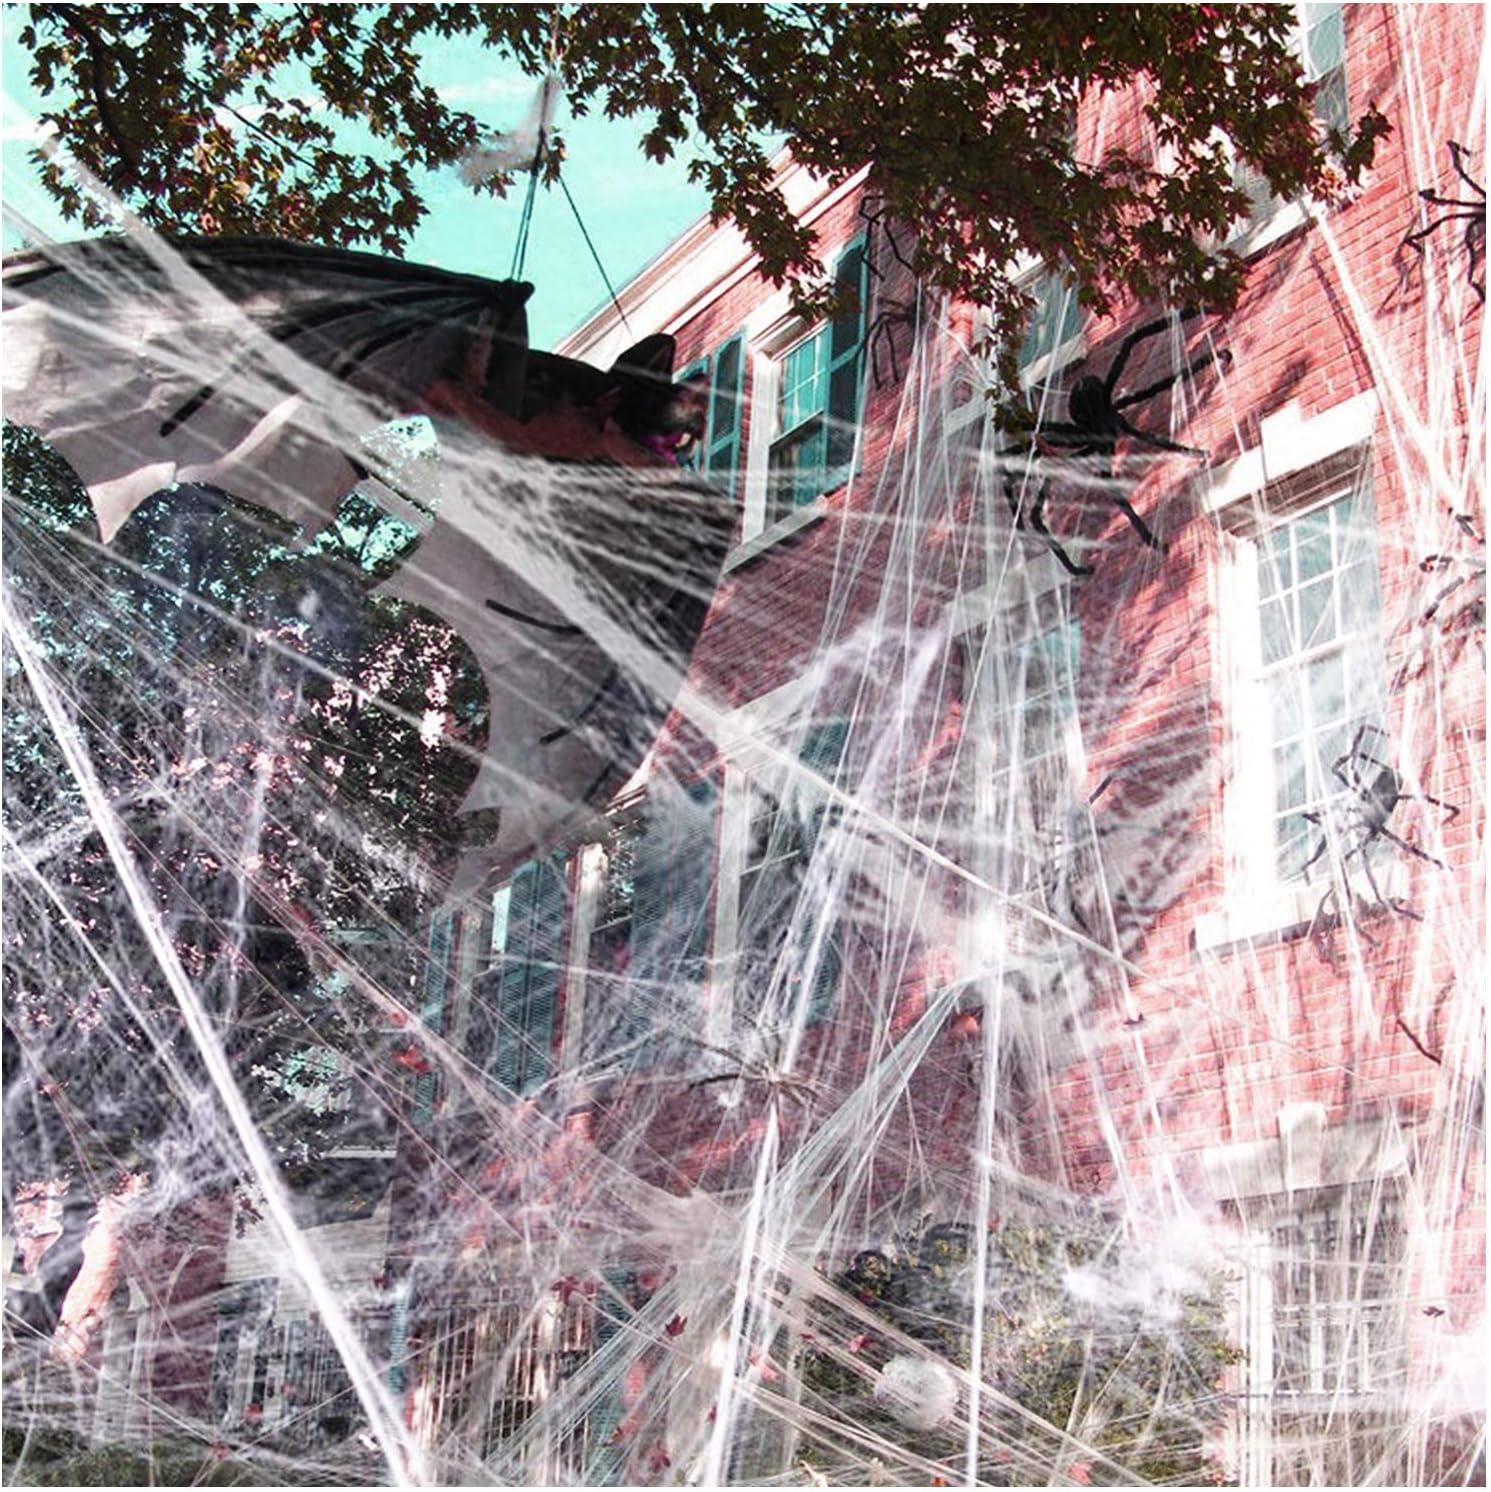 1000 sqft Halloween Spider Web Decorations, VIRIITA Super Stretch Fake Spider Webs, White Webbing Spooky Cobwebs Halloween Supplies for Halloween Party Decorations Bar Haunted House